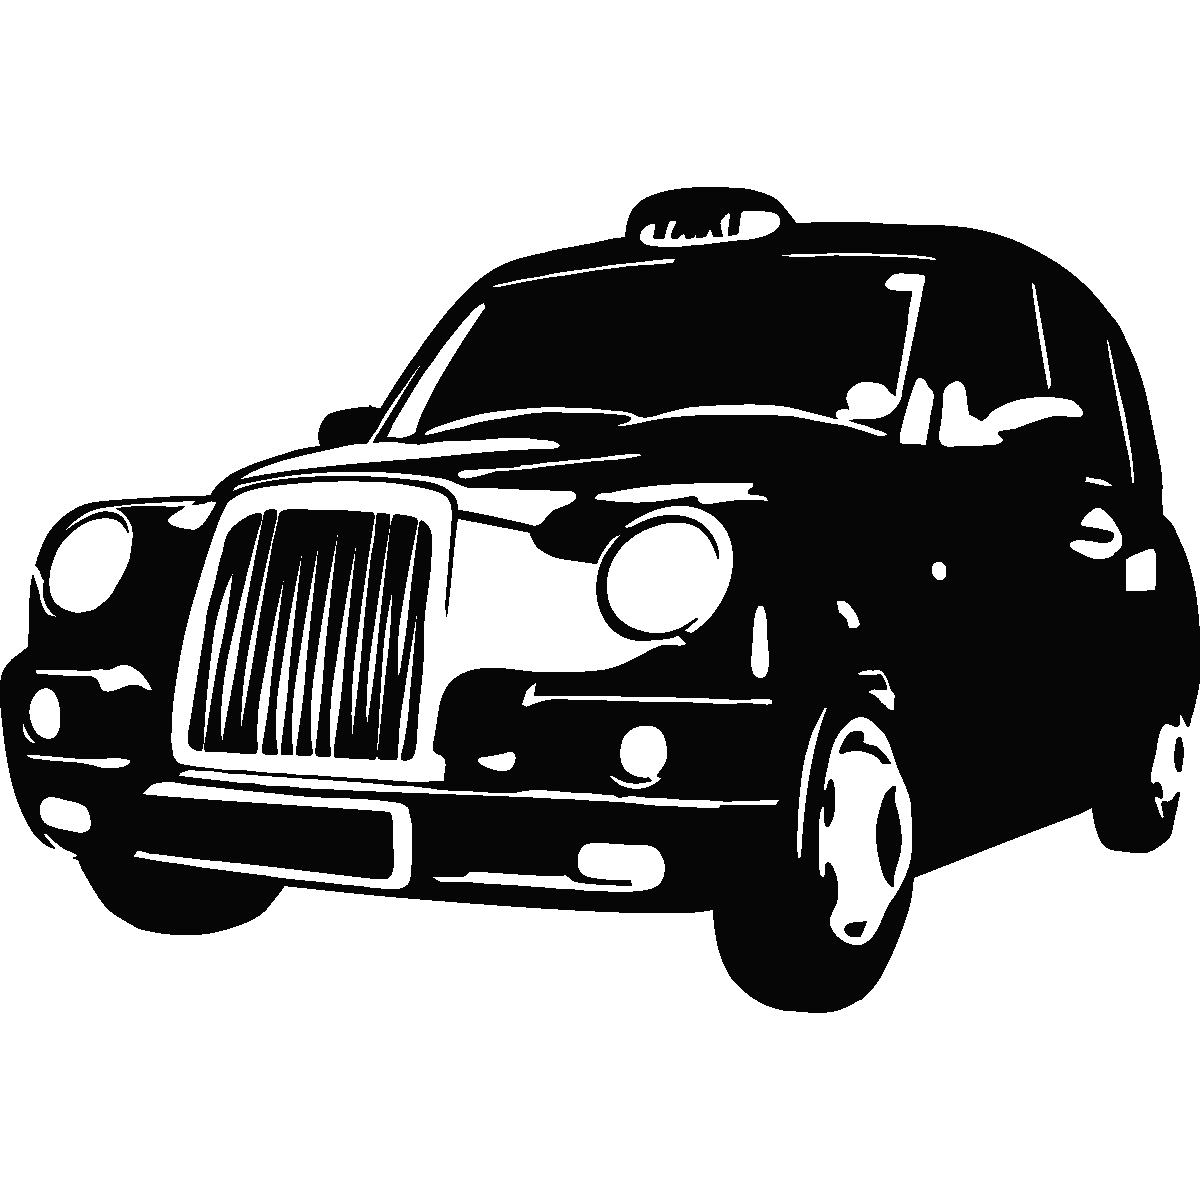 Adesivi Murali Urbani Adesivo London Taxi 1 Ambiance Sticker Com.